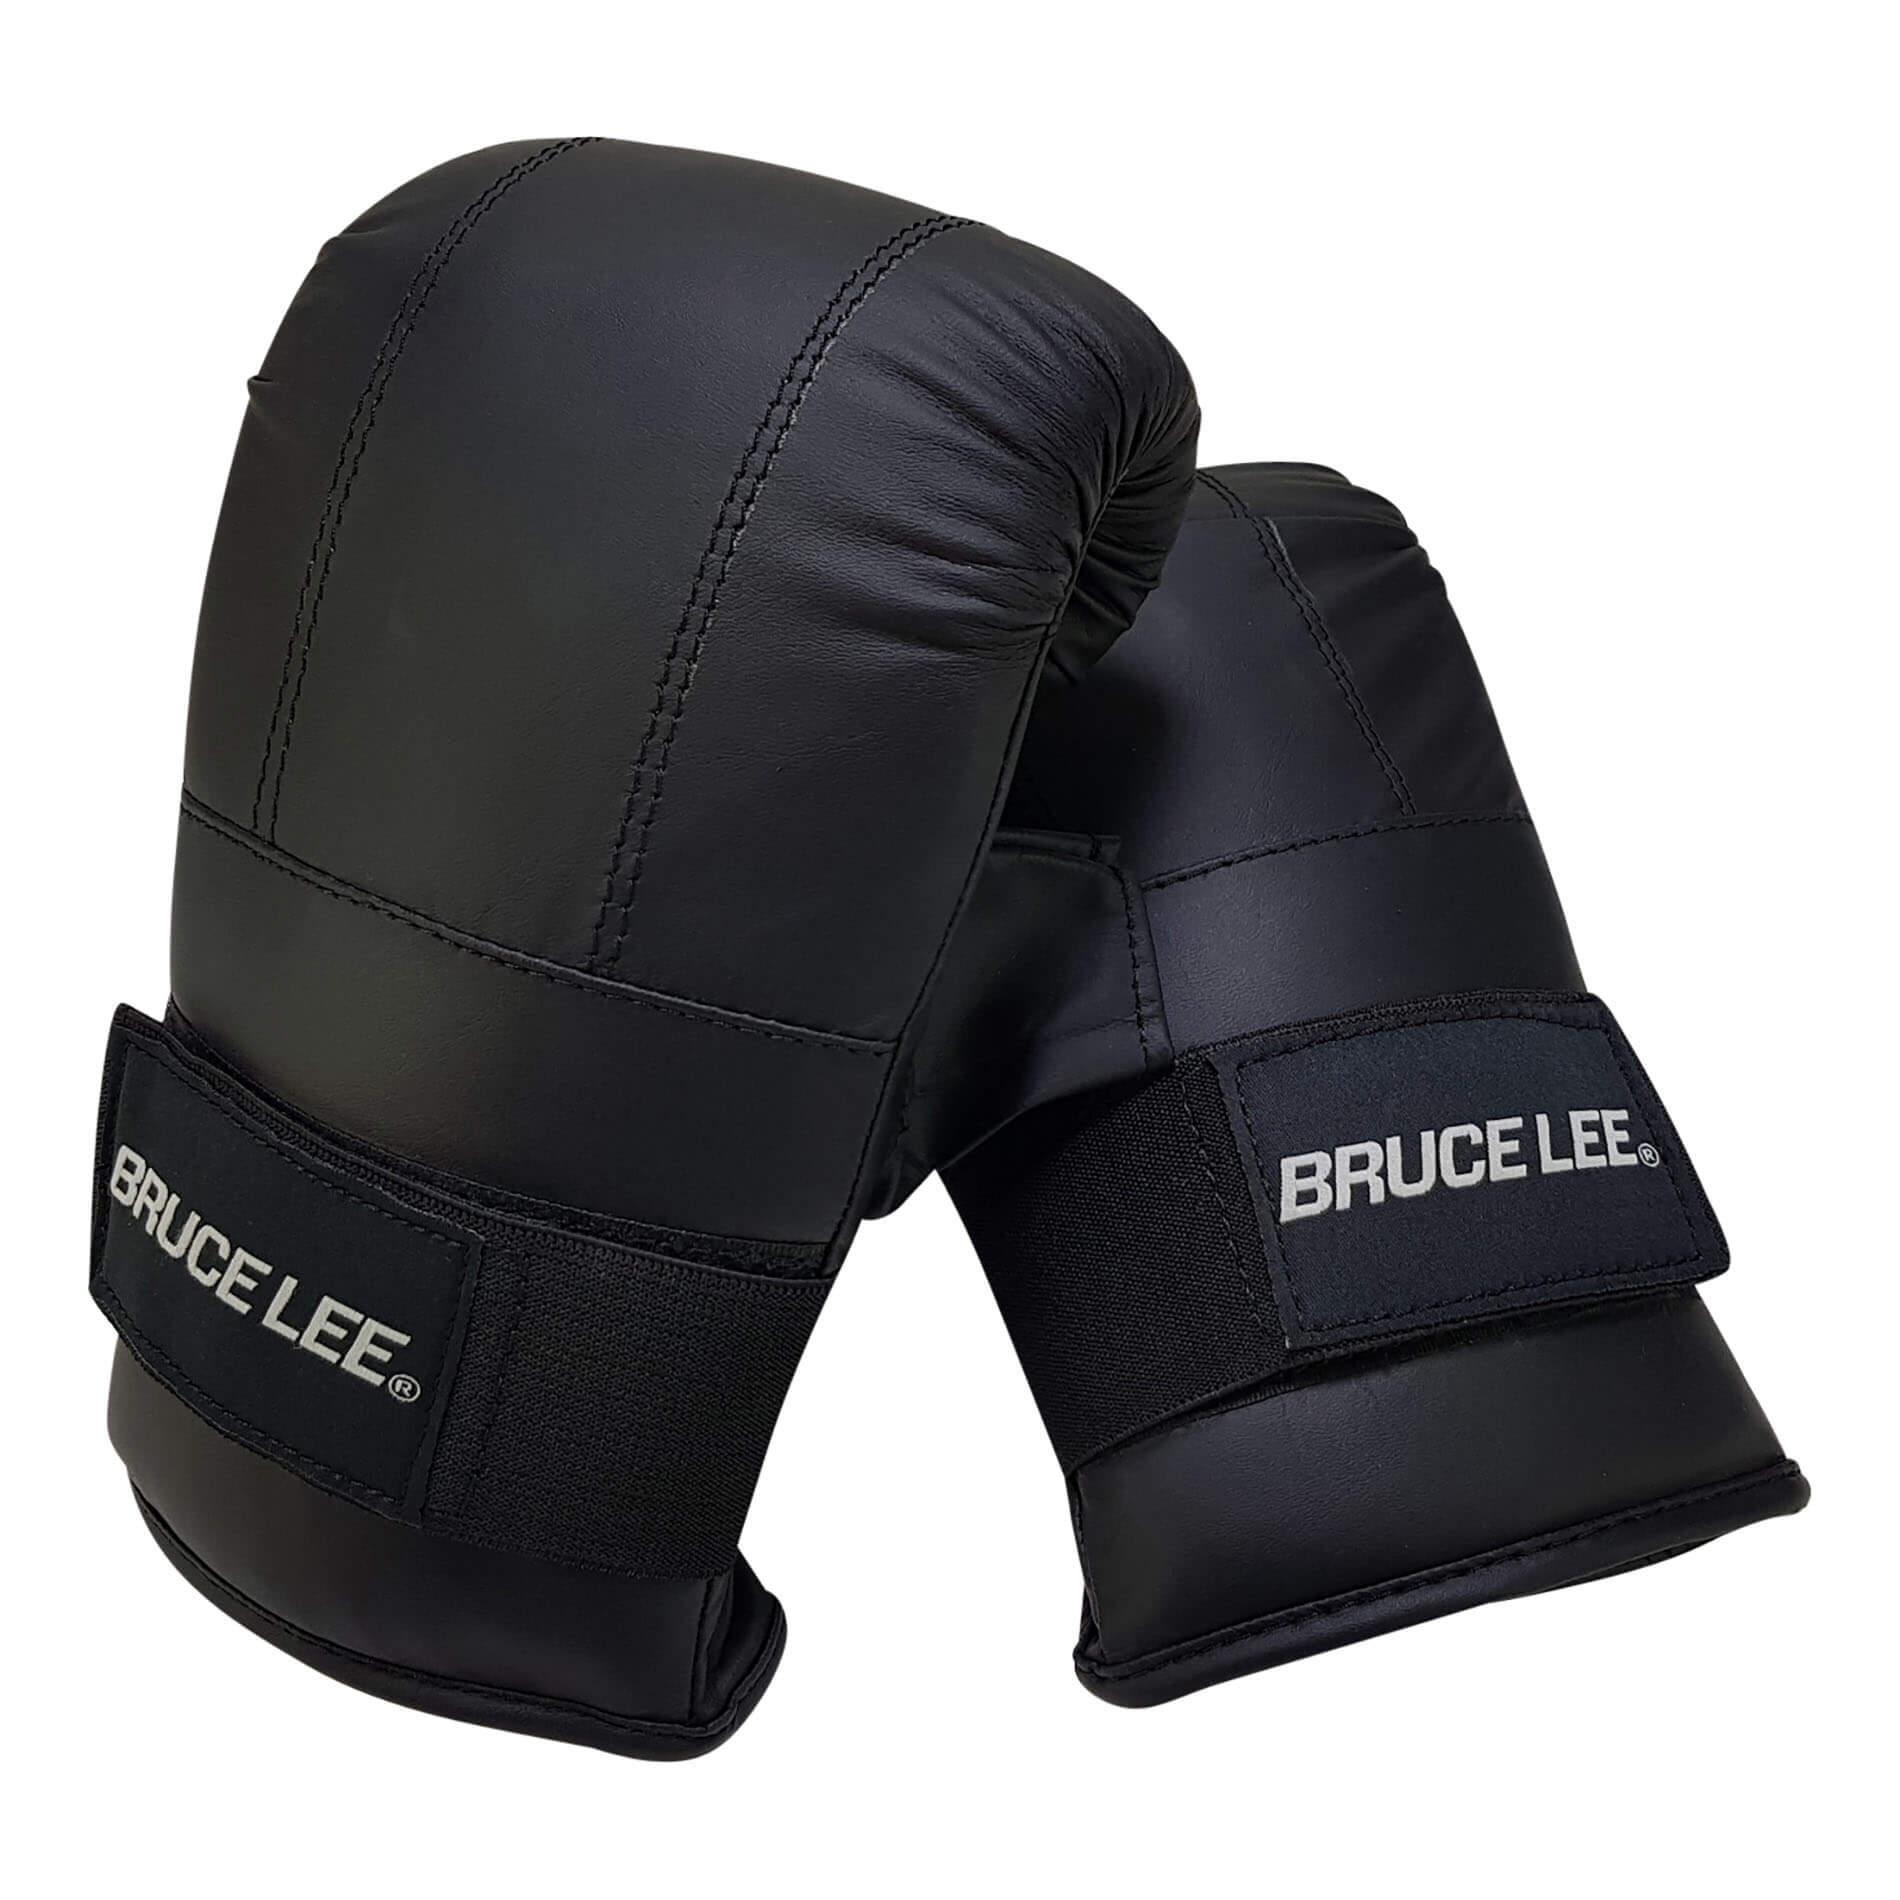 Allround Bokszak handschoenen - Trainingshandschoenen - PU - Sr